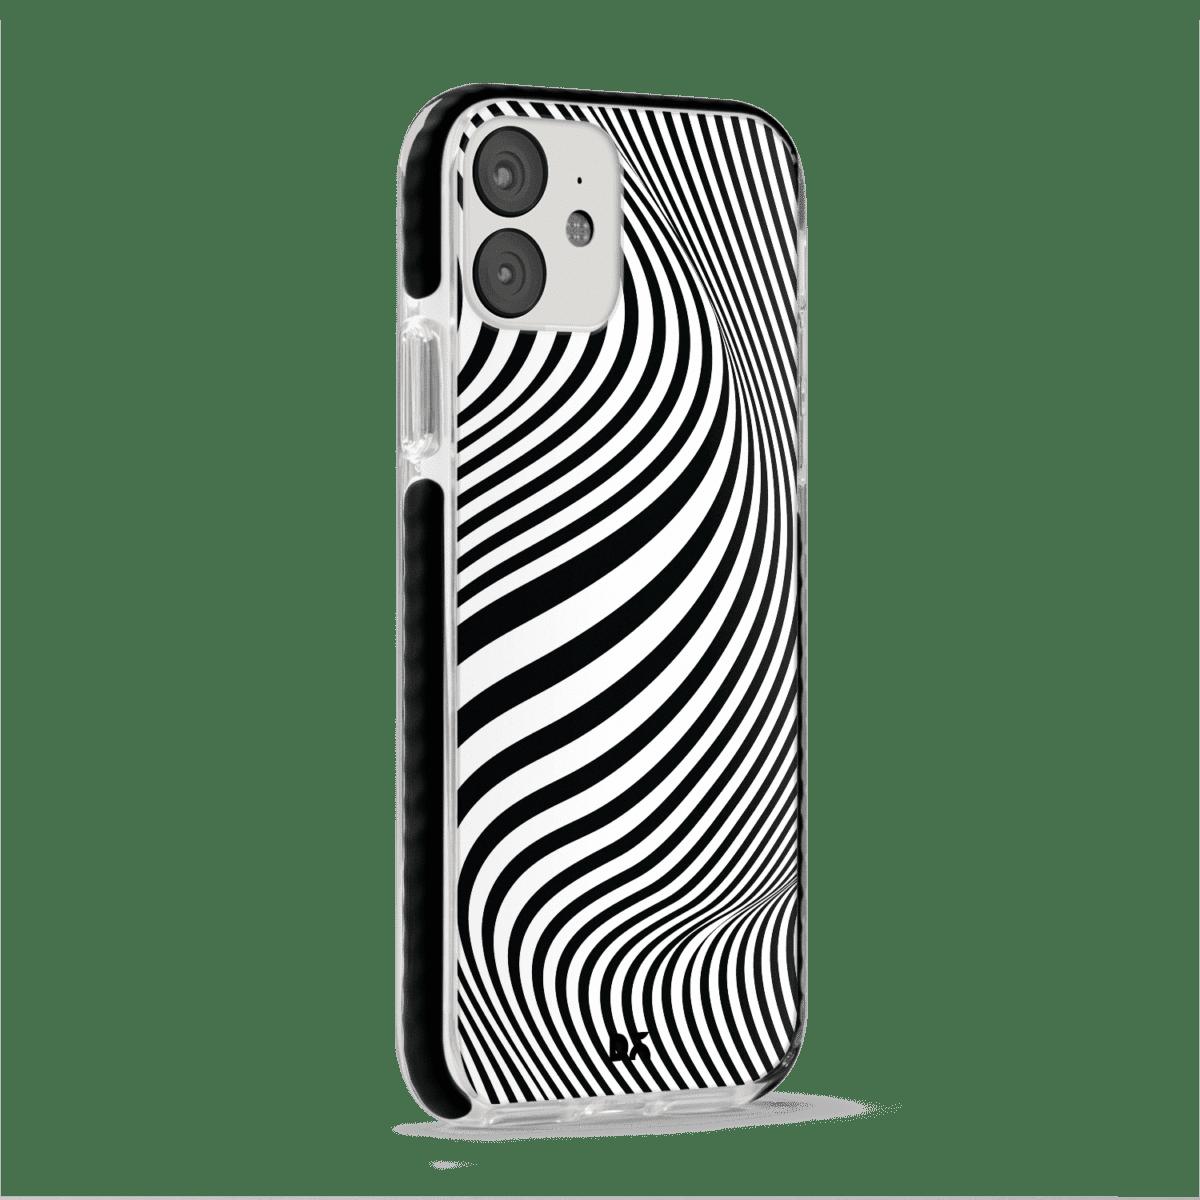 Zebra Stride Case Cover for Apple iPhone 12 Mini with great design and shock proof | Klippik | Online Shopping | Kuwait UAE Saudi